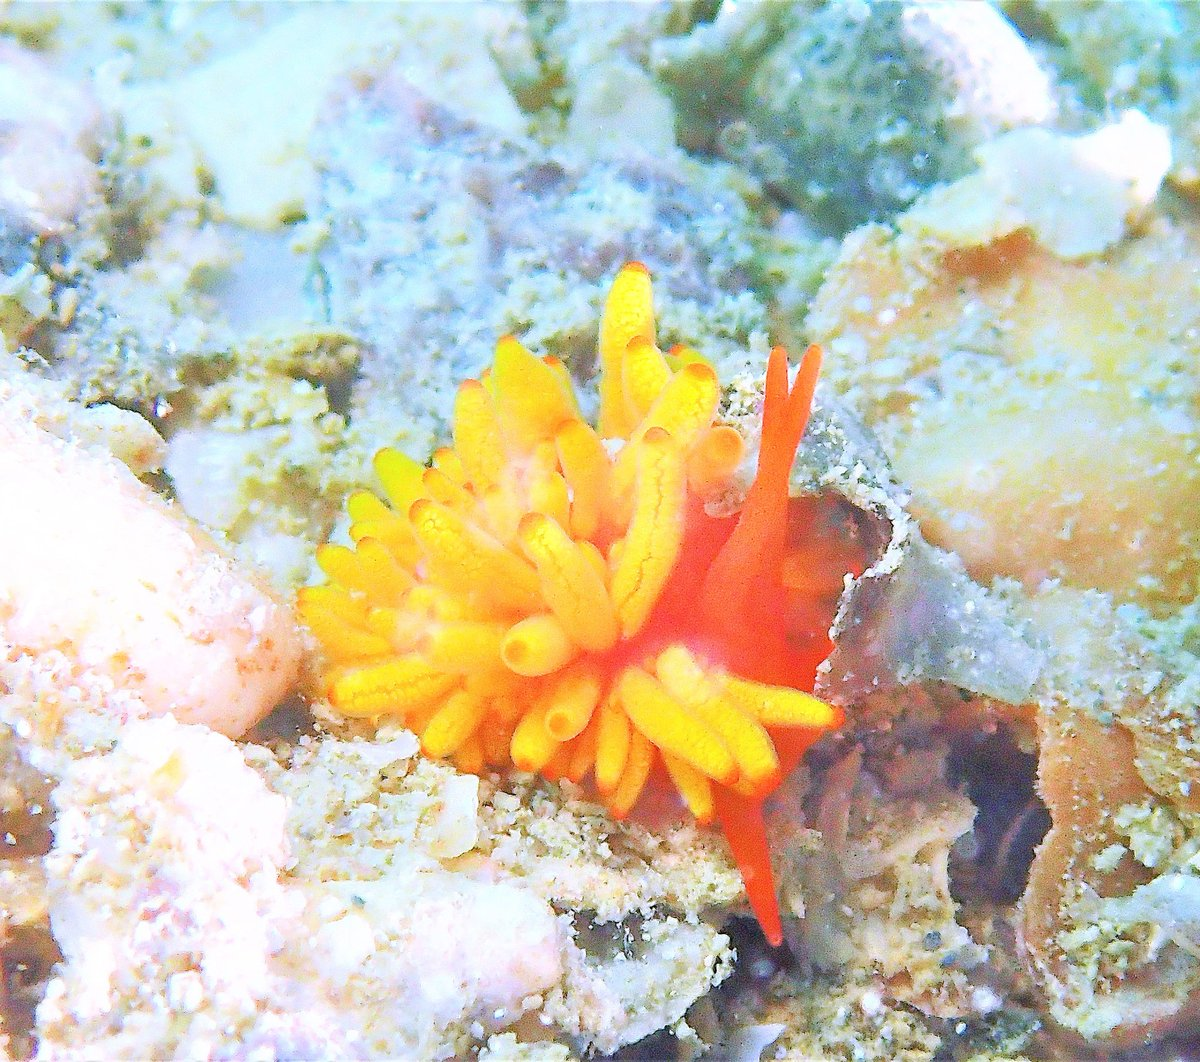 Okinawa Diving  #スキューバダイビング #沖縄 #ウミウシ #オリンパス #scubadiving #okinawa #underwater #aqua_gallery #nudibranch #ocean #nature #natural http://instagram.com/b.b.fish/pic.twitter.com/tOMZPYYj14